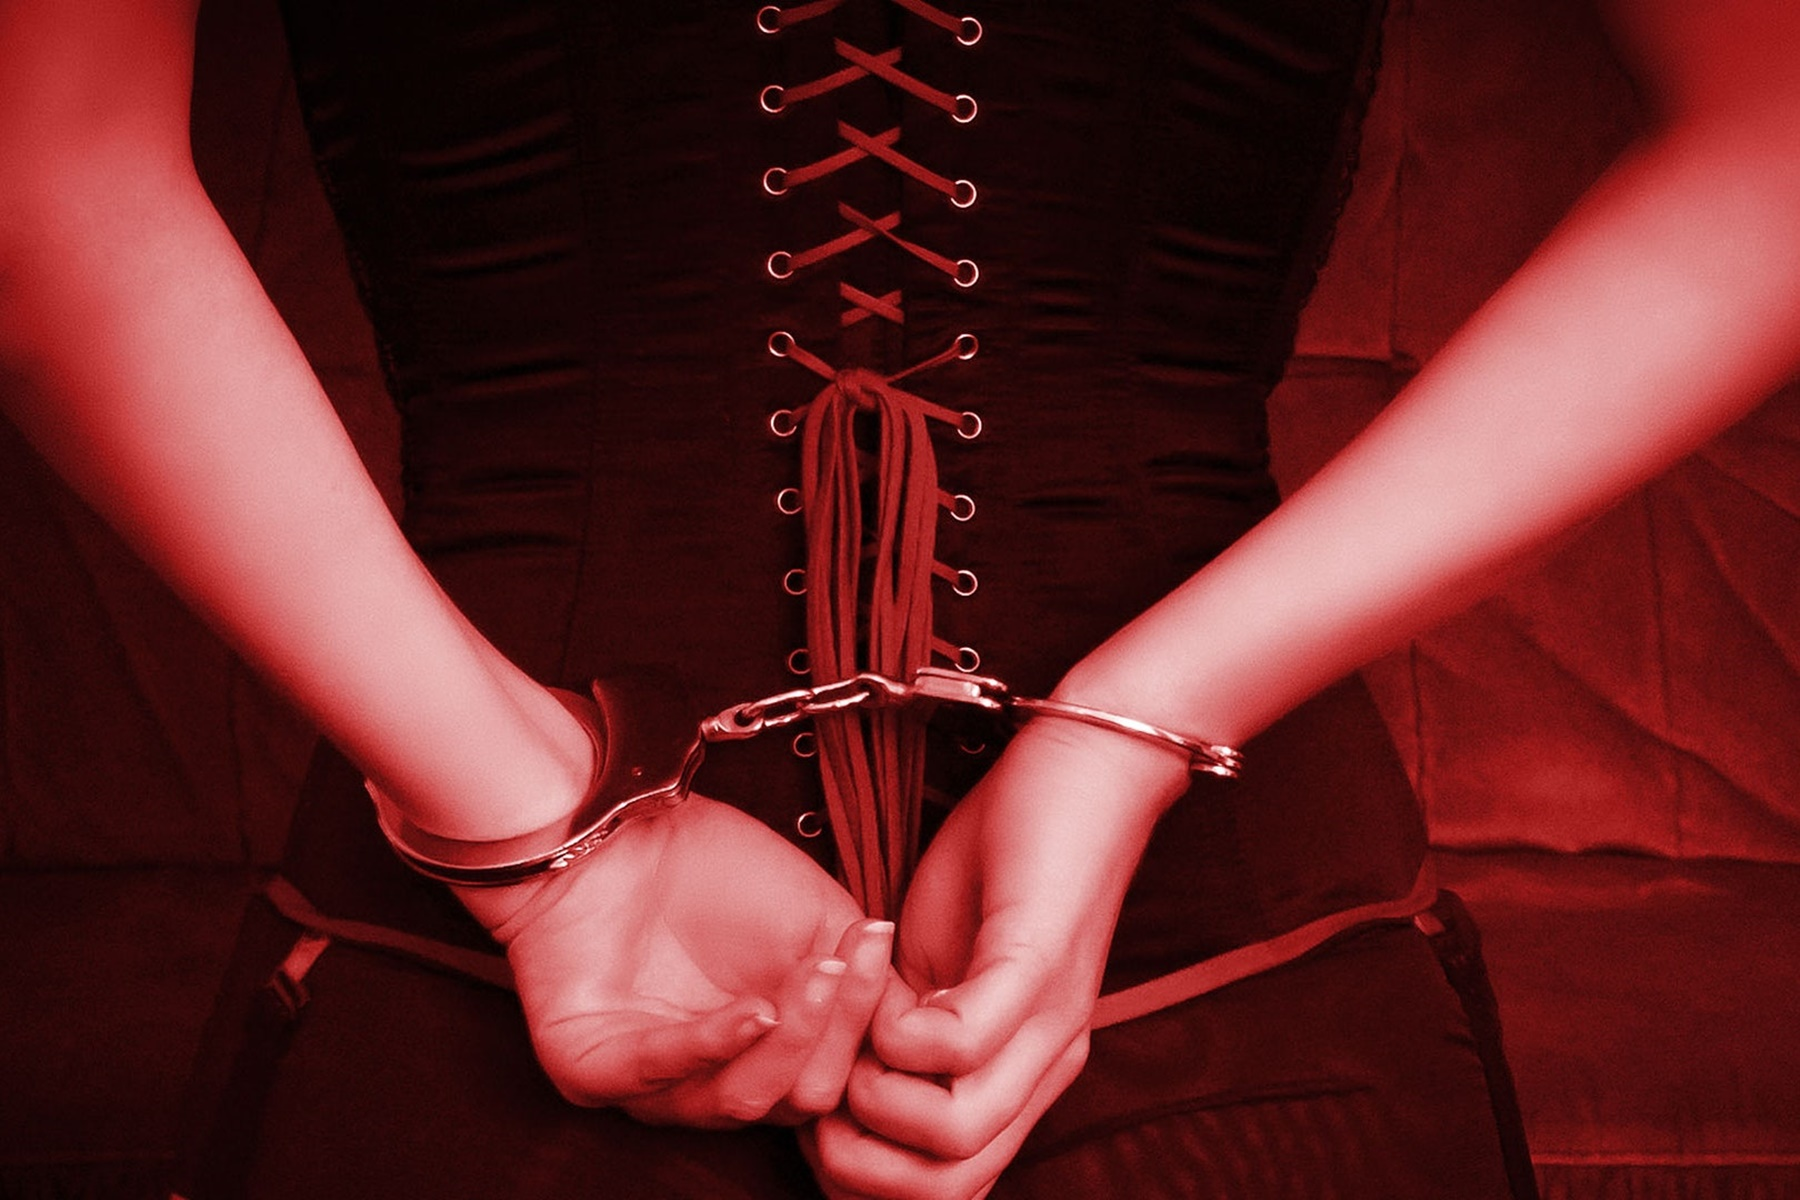 BDSM : Τα σεξουαλικά φετίχ τα έχουν συγκεκριμένες κοινωνικές ομάδες